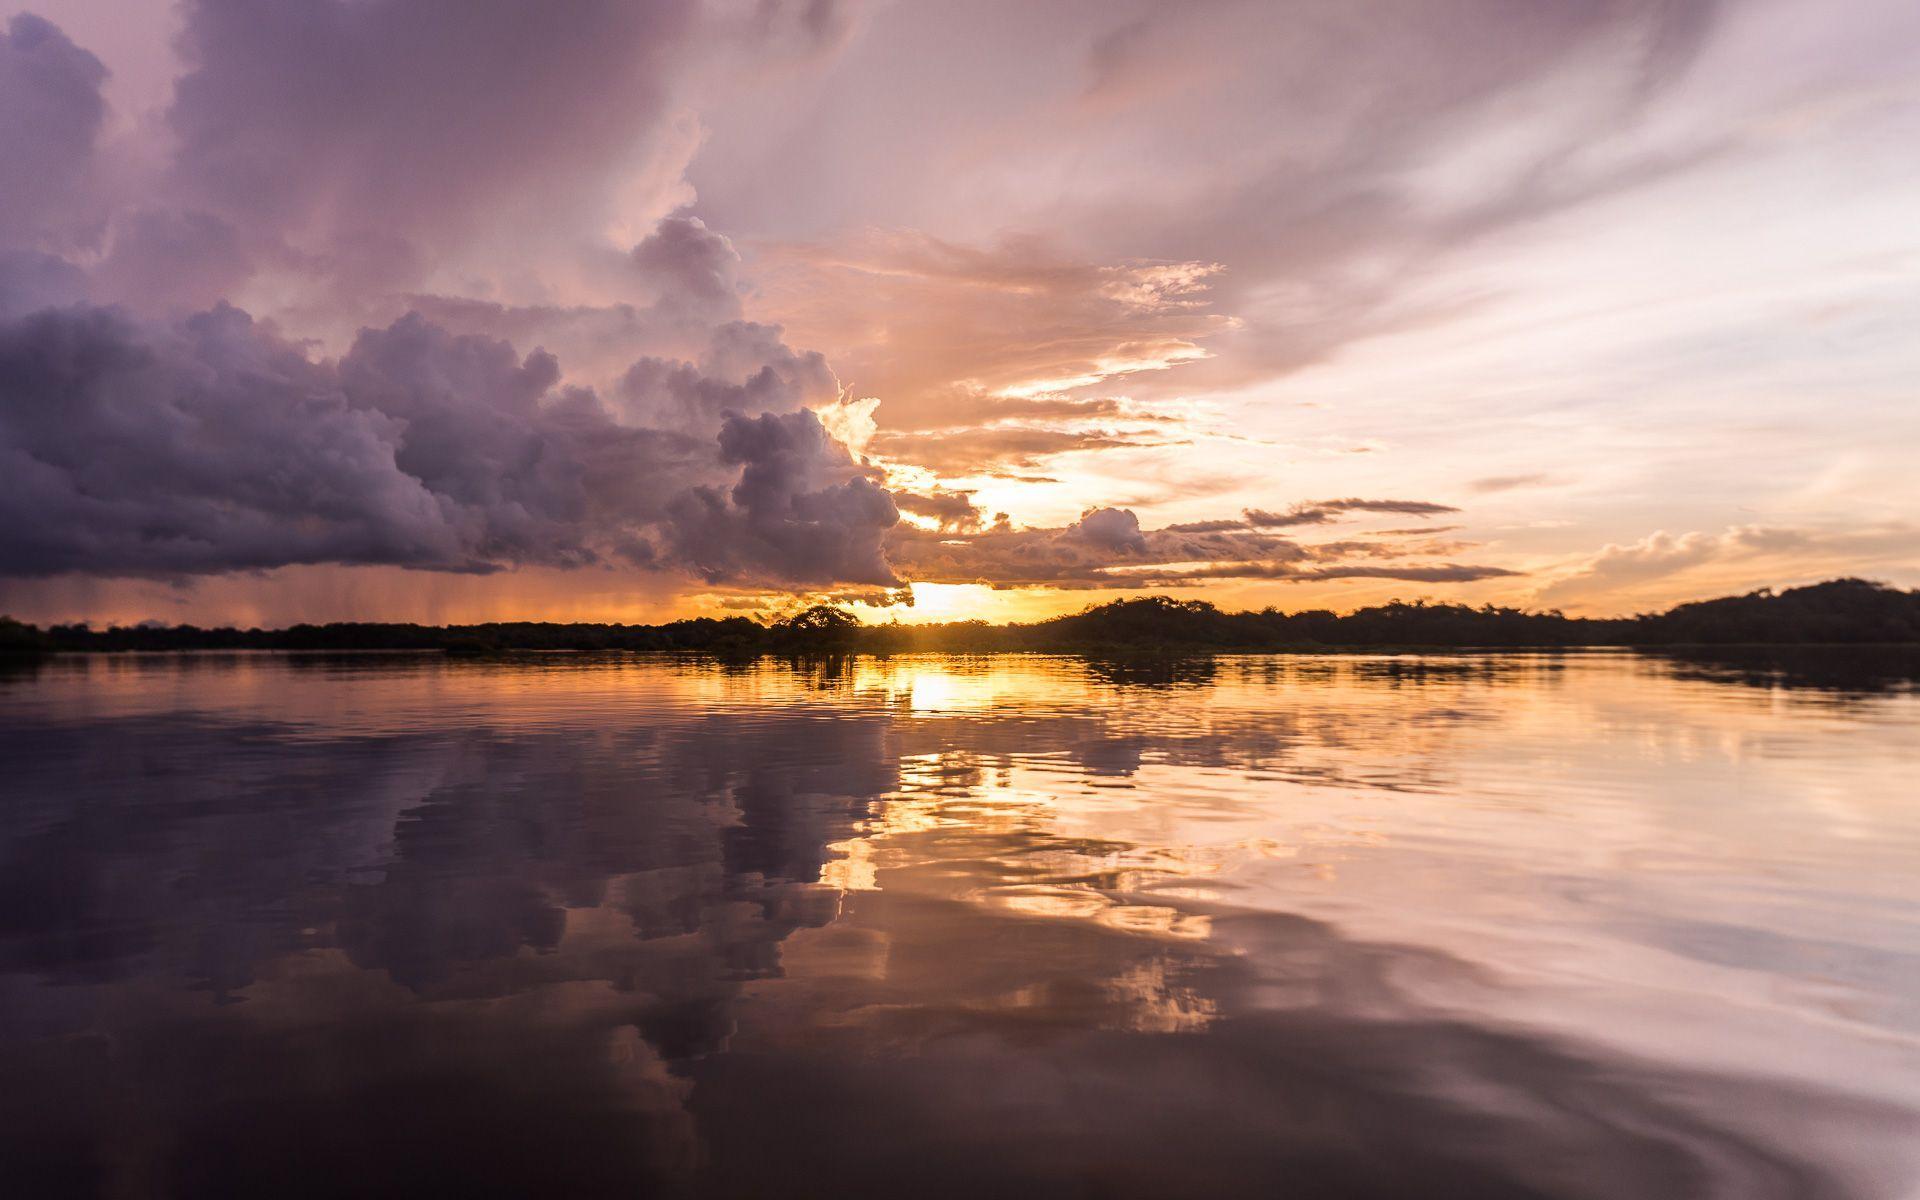 Lesvoyageuses-voyage-au-bresil-guide-conseils-amazonie-4